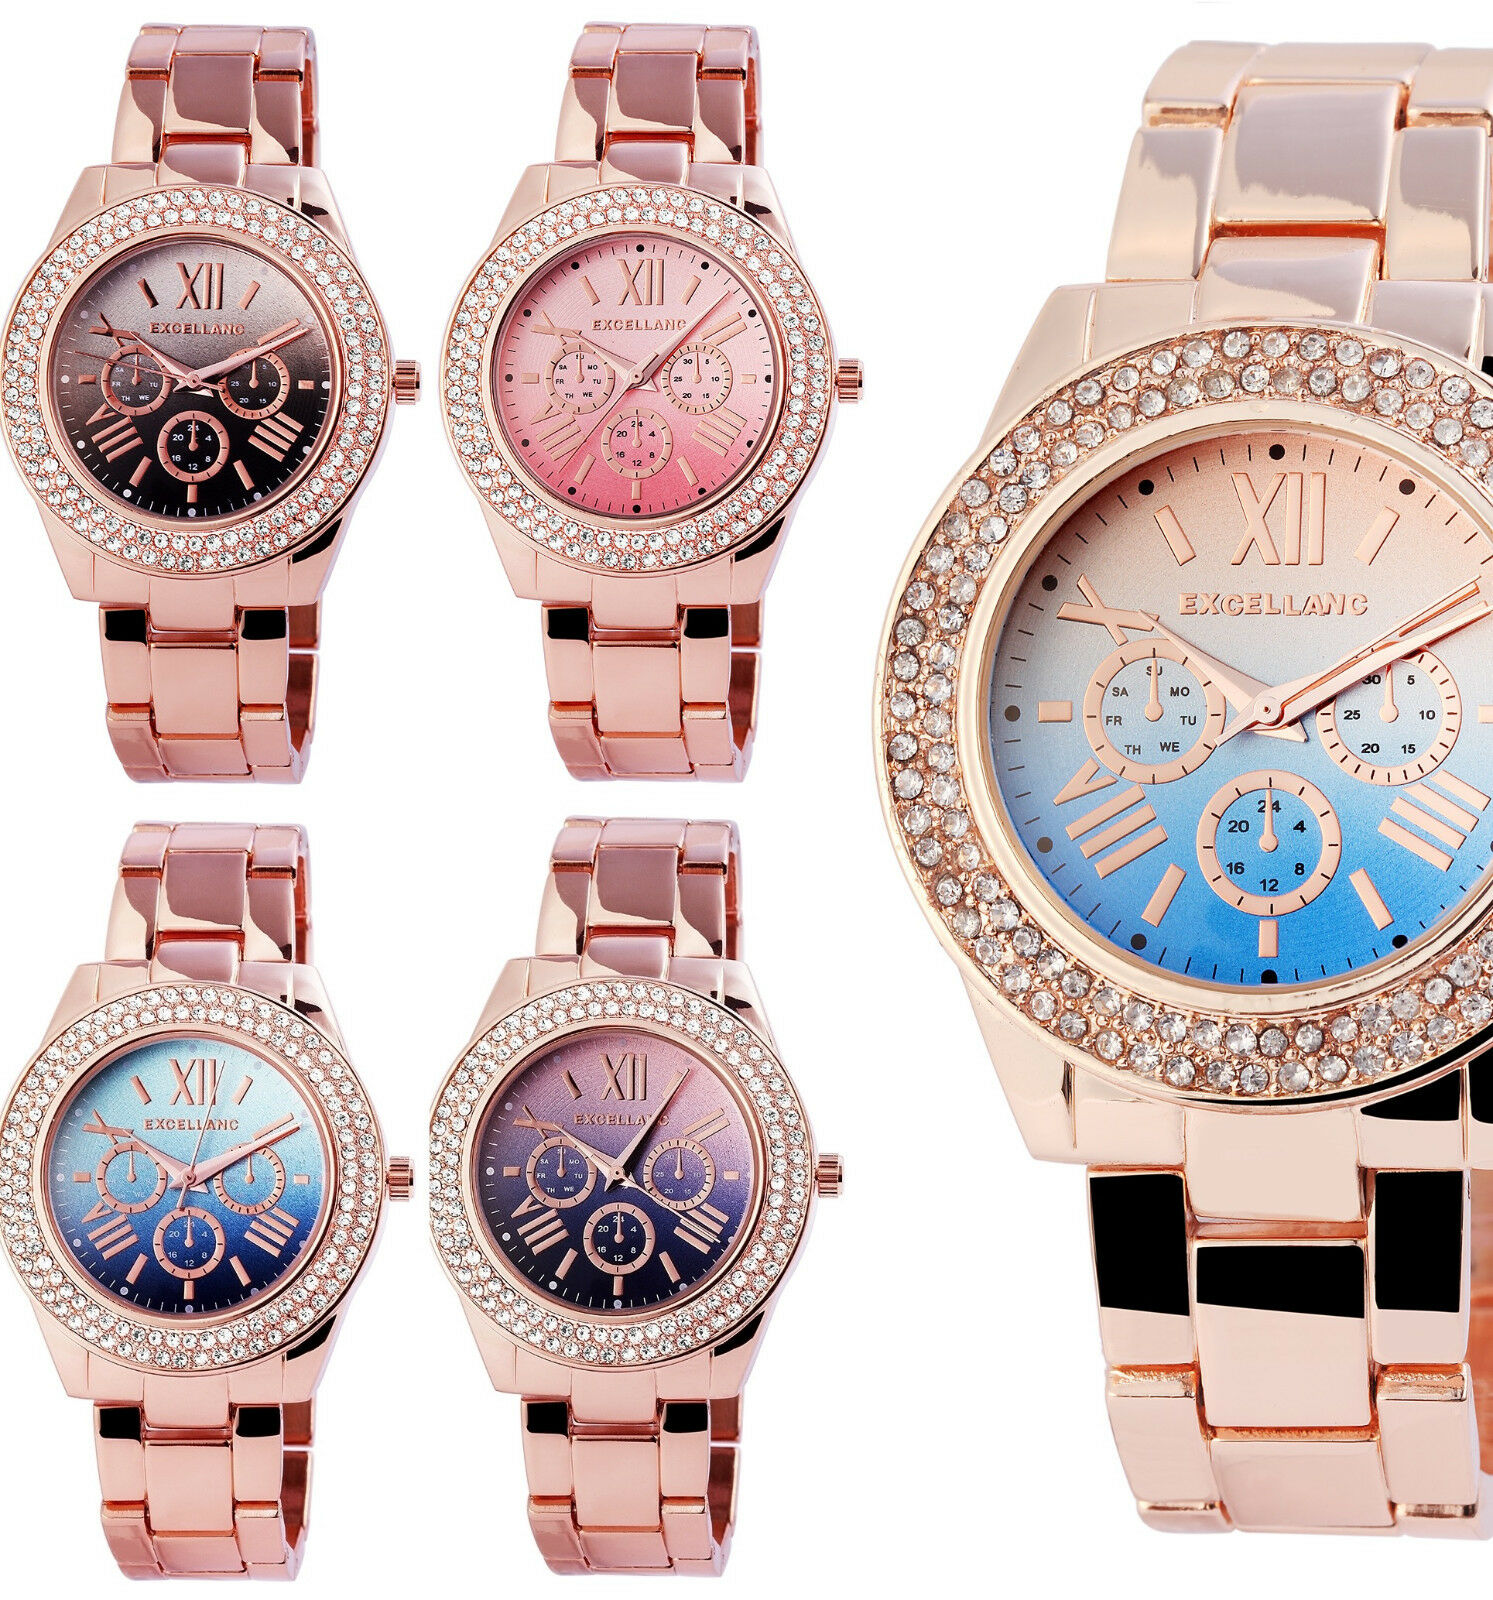 elegante Excellanc Damenuhr Armbanduhr Rosegold Metallarmband 4 Farben wählbar